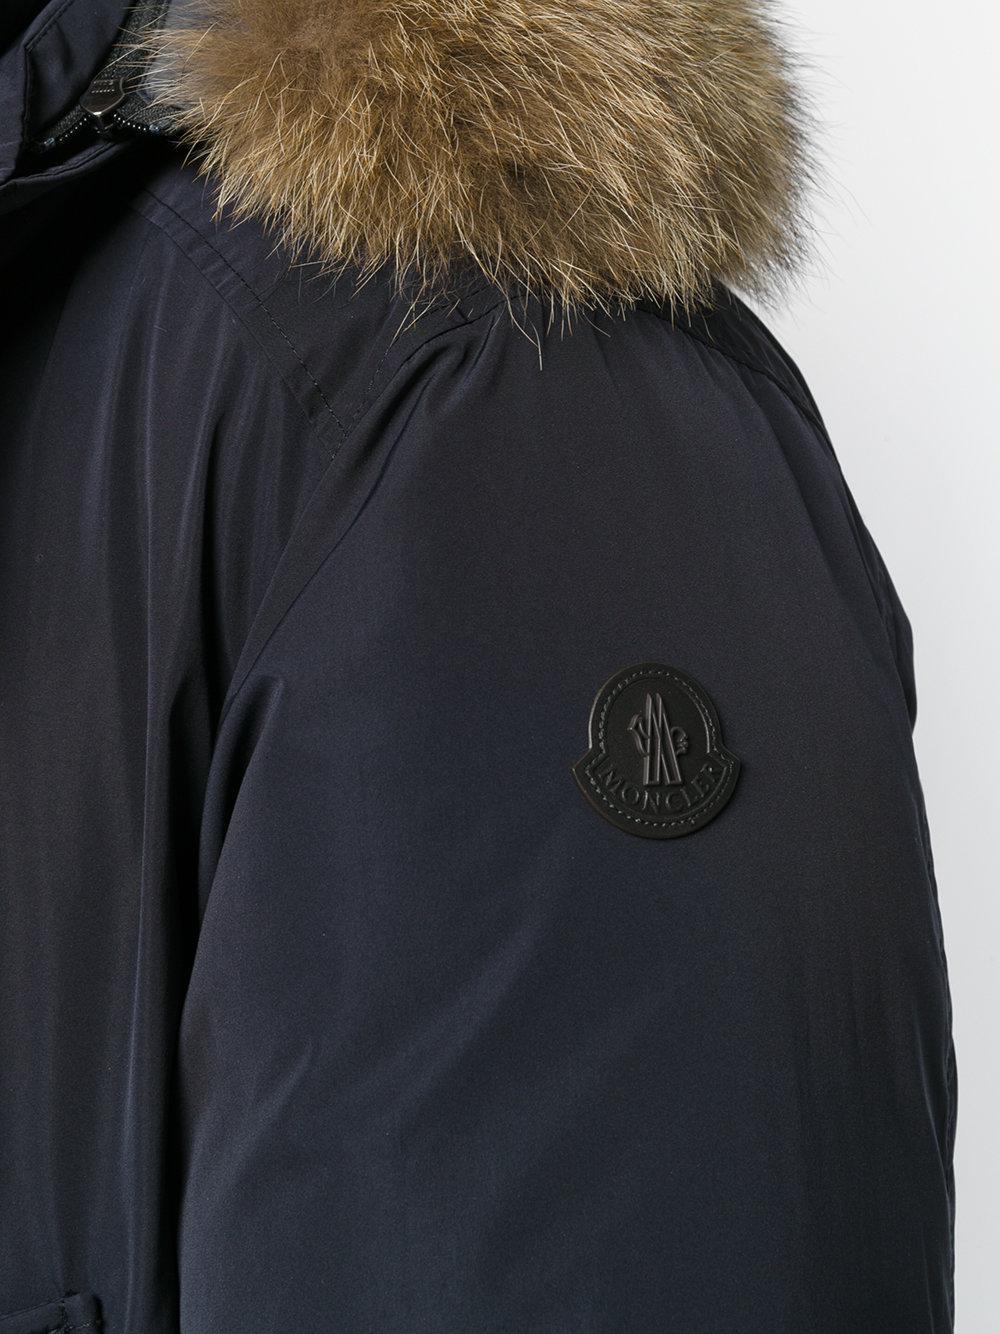 Moncler - Blue River Parka Coat for Men - Lyst. View fullscreen